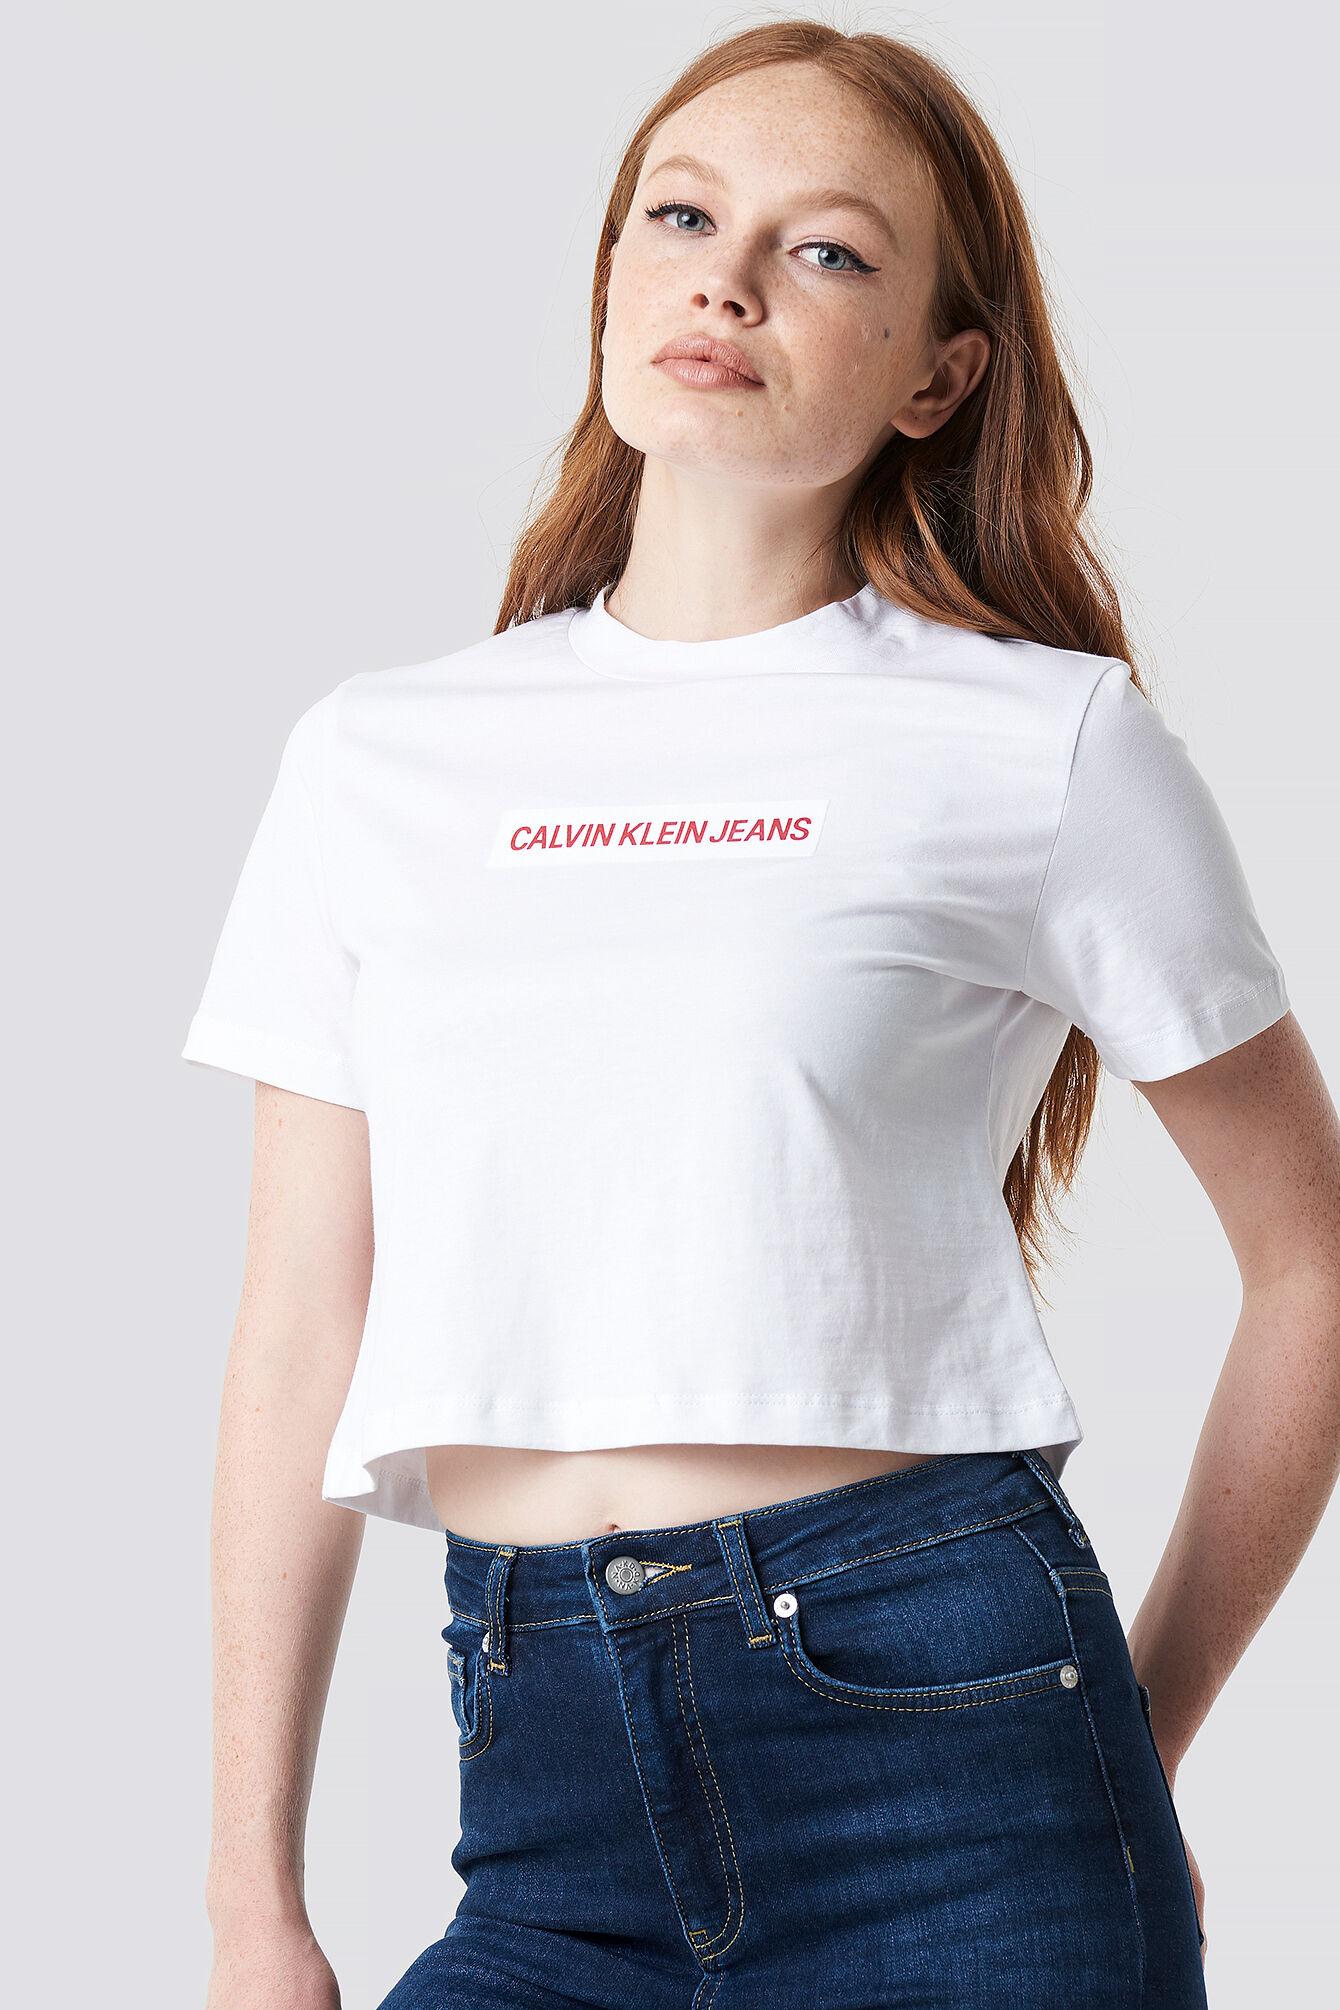 Calvin Klein Croppped Institutional Flock Box Tee - White